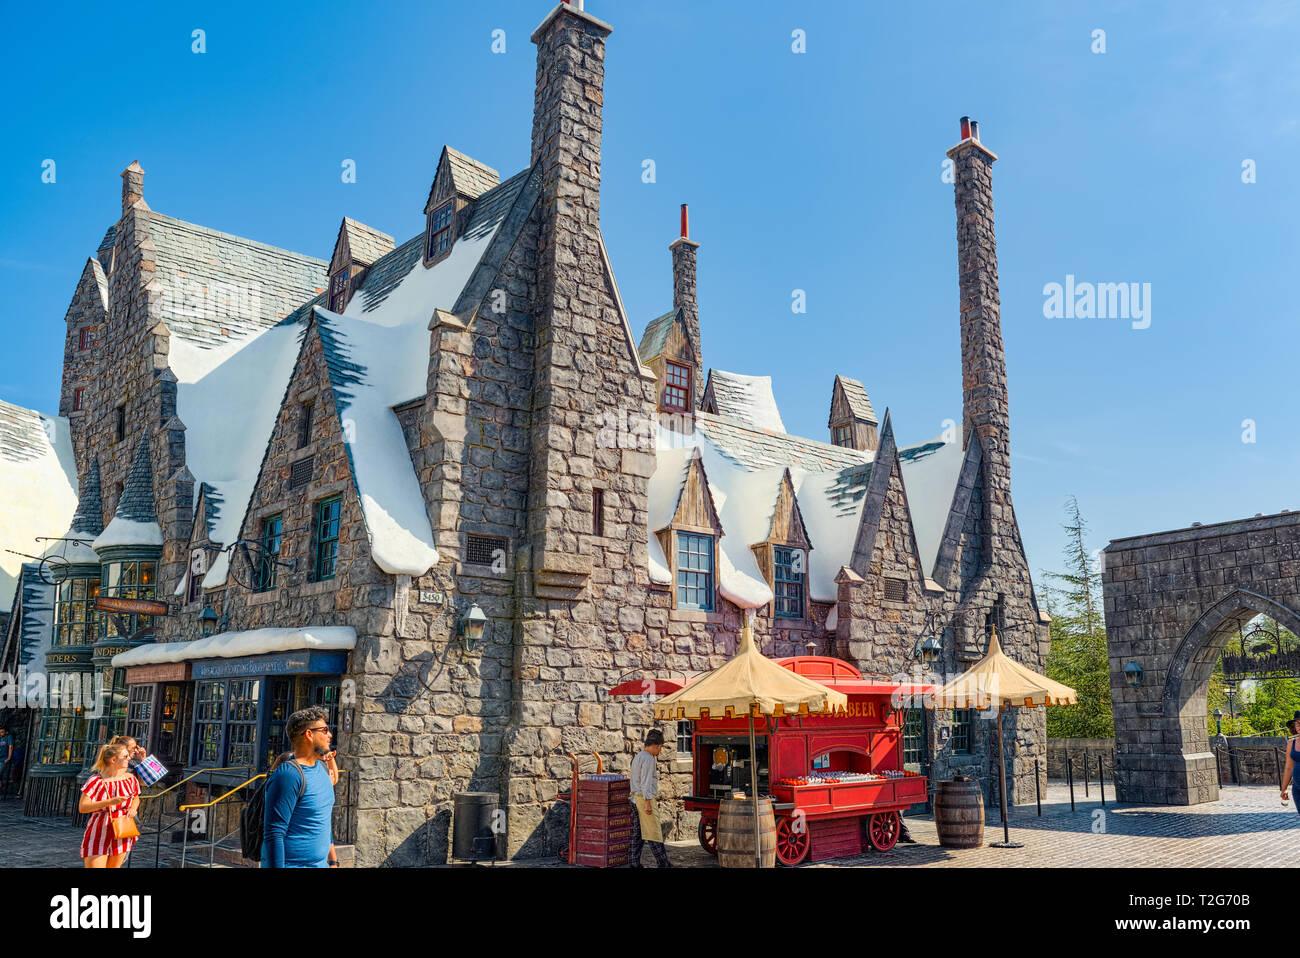 Magic Castle Hollywood California Stock Photos & Magic